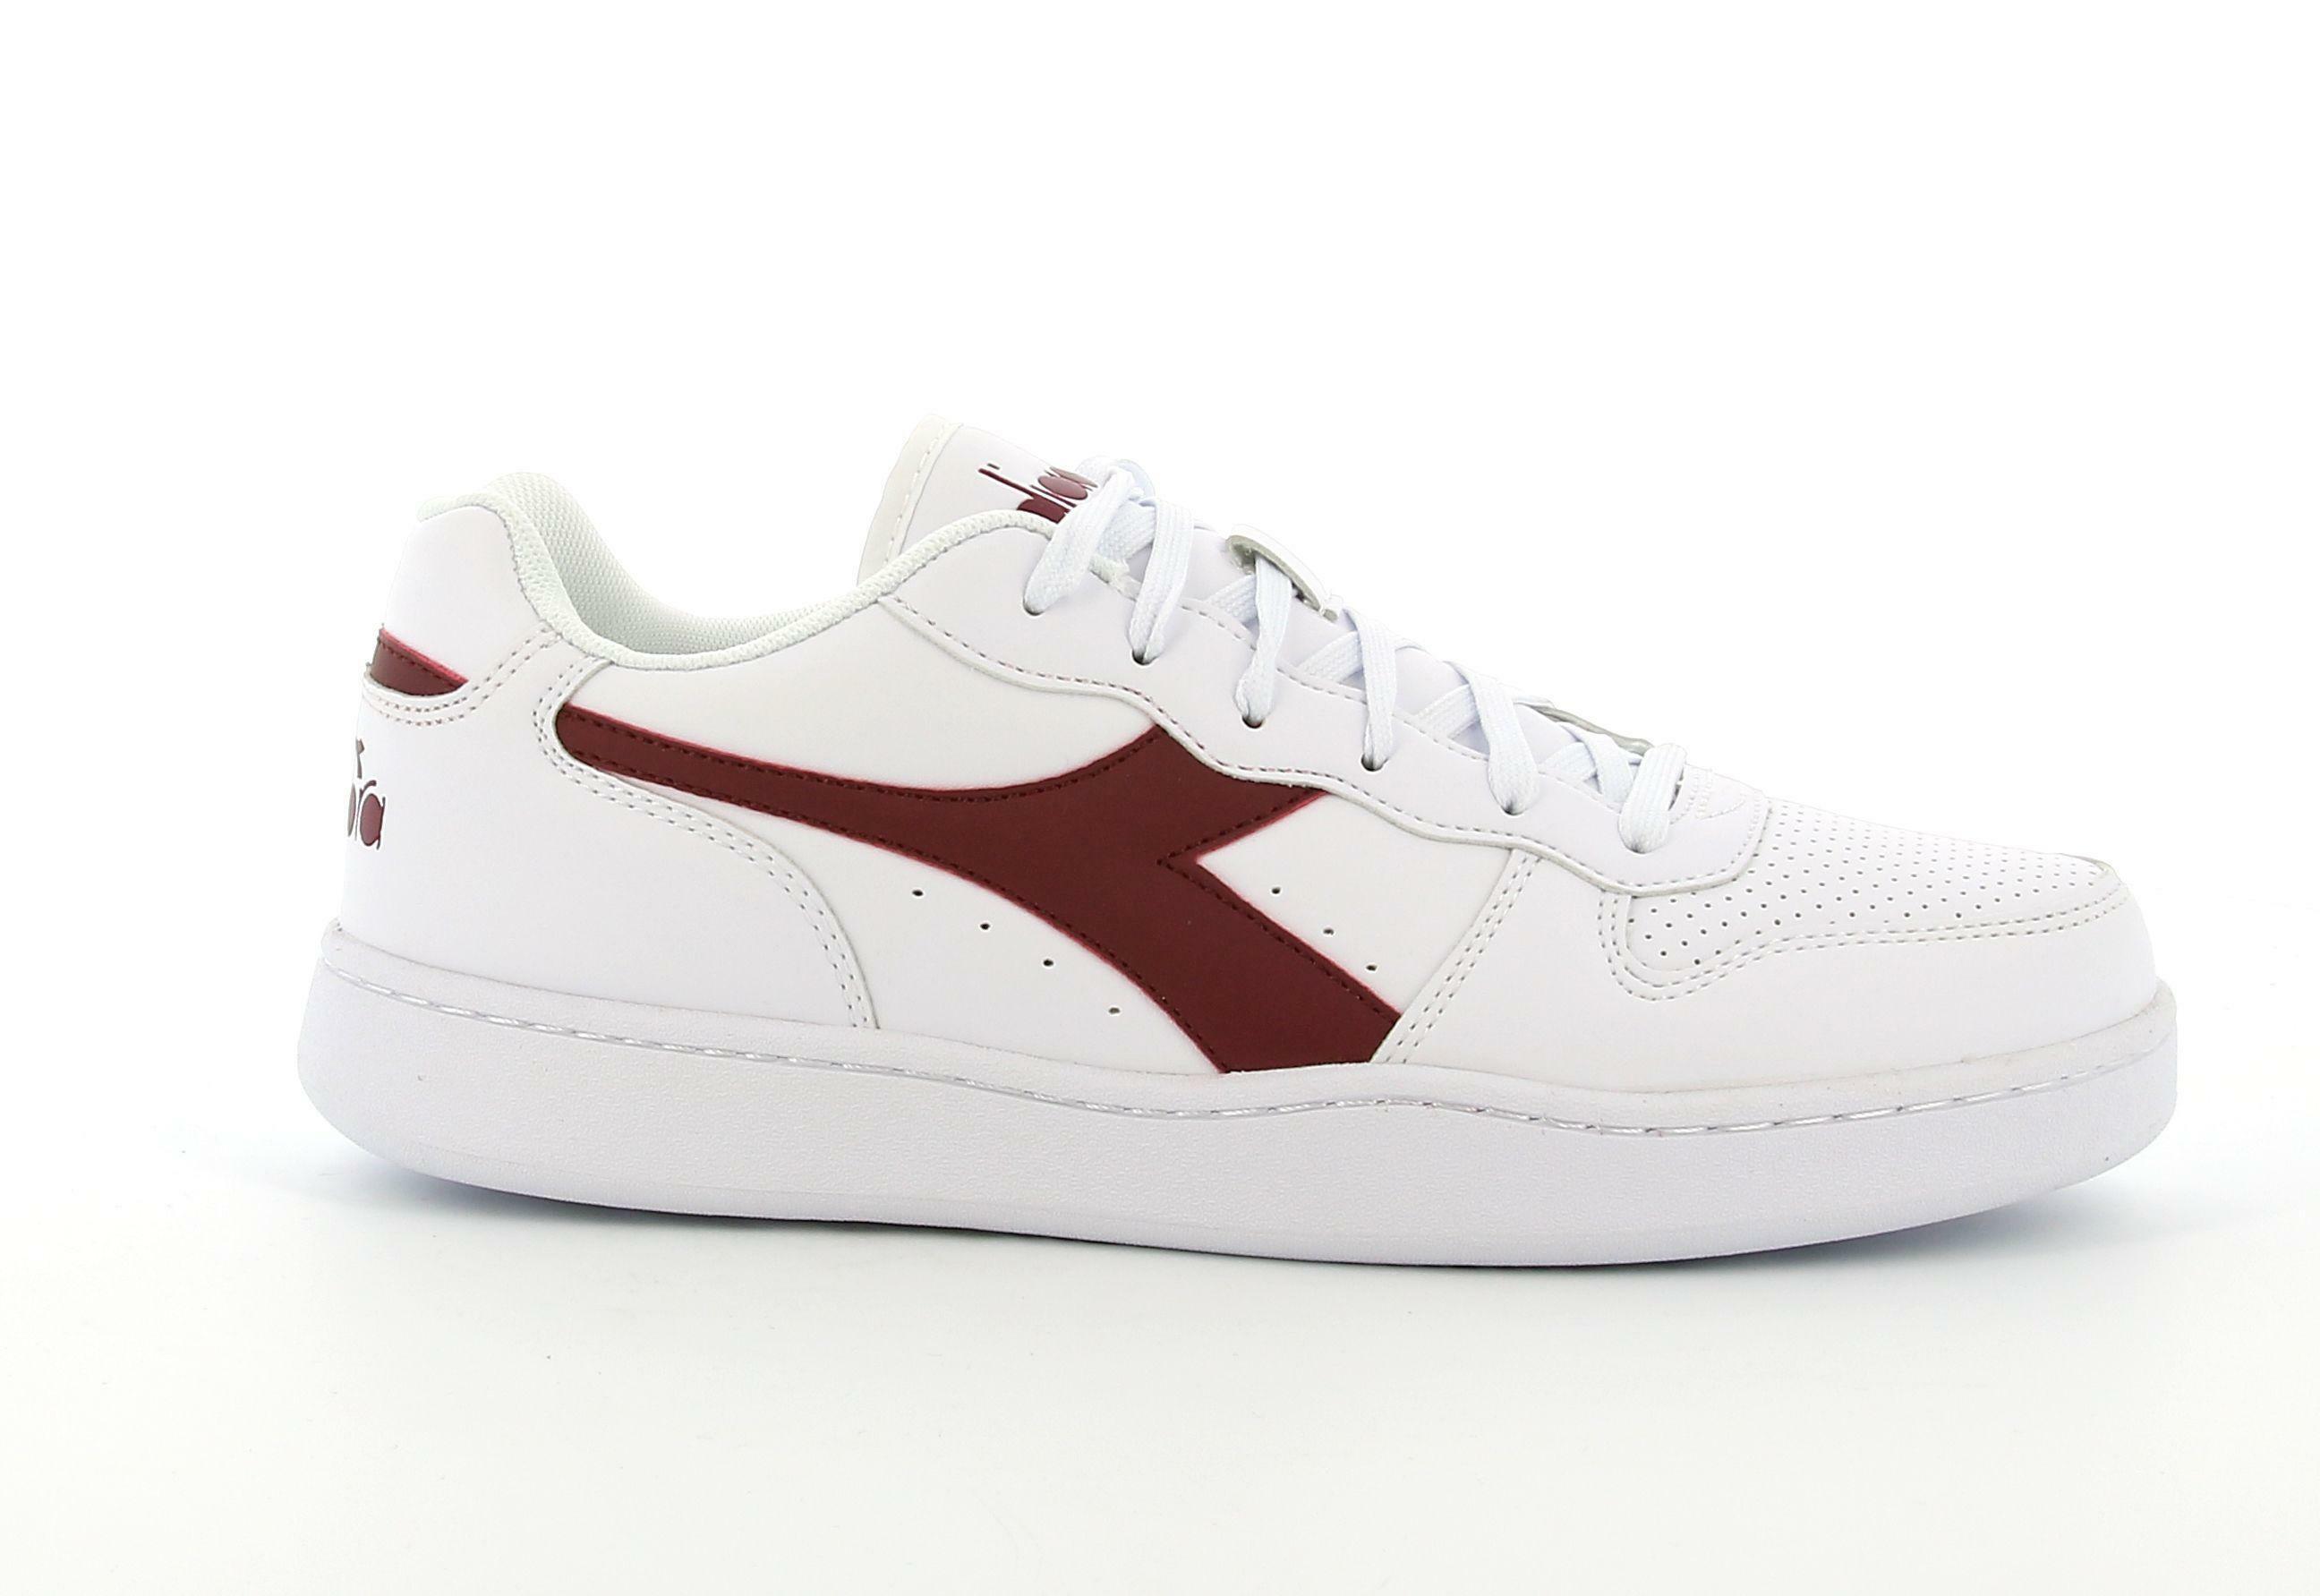 diadora diadora playground scarpe con lacci uomo  bianco viola prugna 172319 bianco